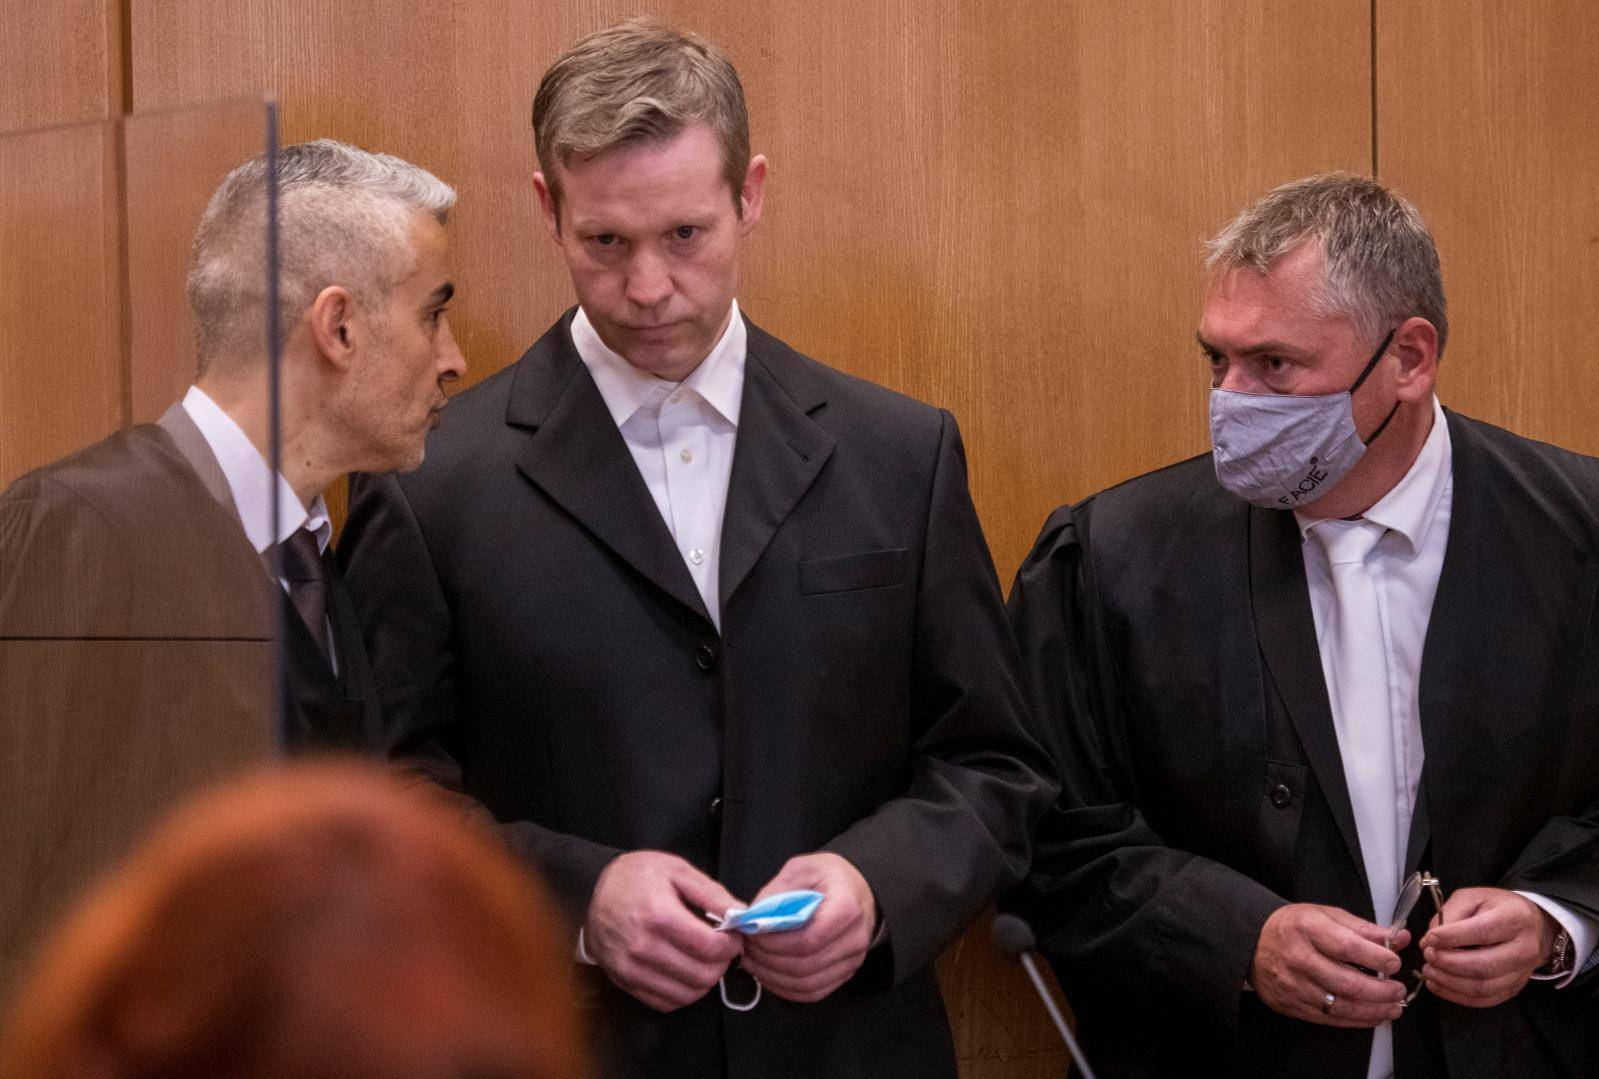 Murder trial begins in assassination of Walter Luebcke, in Frankfurt